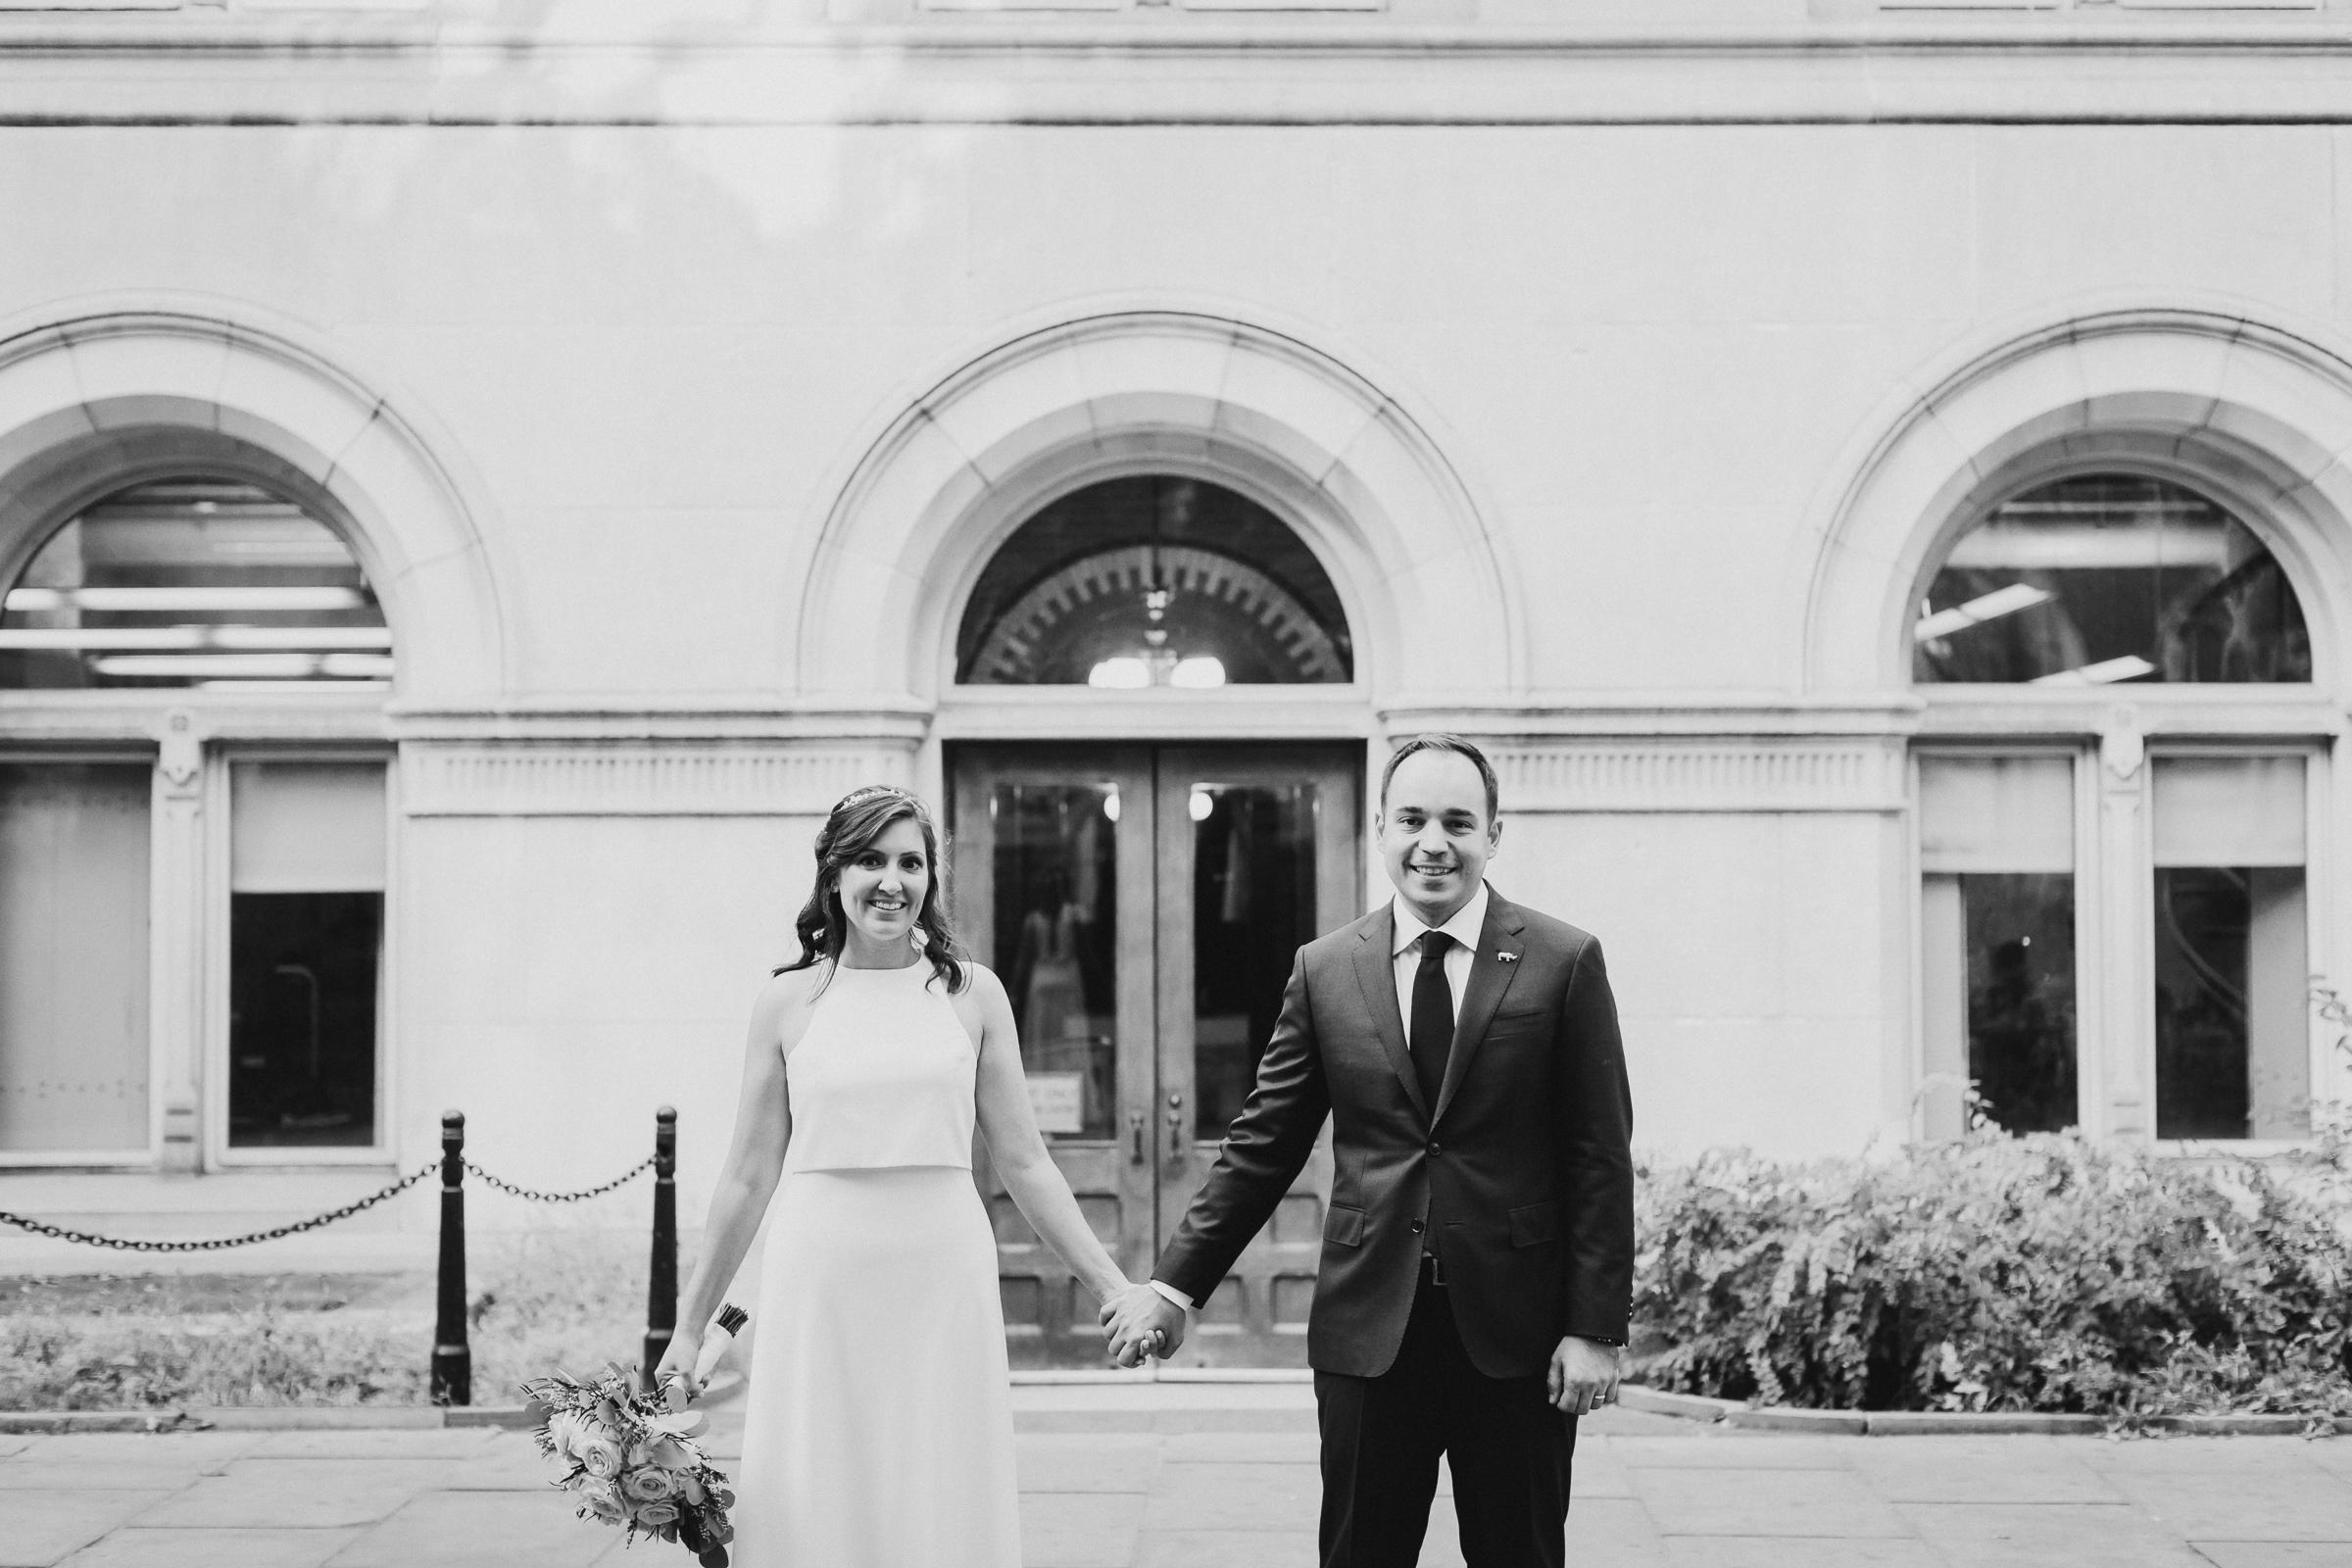 Casa-Apicii-Intimate-Wedding-City-Hall-Elopement-New-York-Documentary-Wedding-Photographer-25.jpg